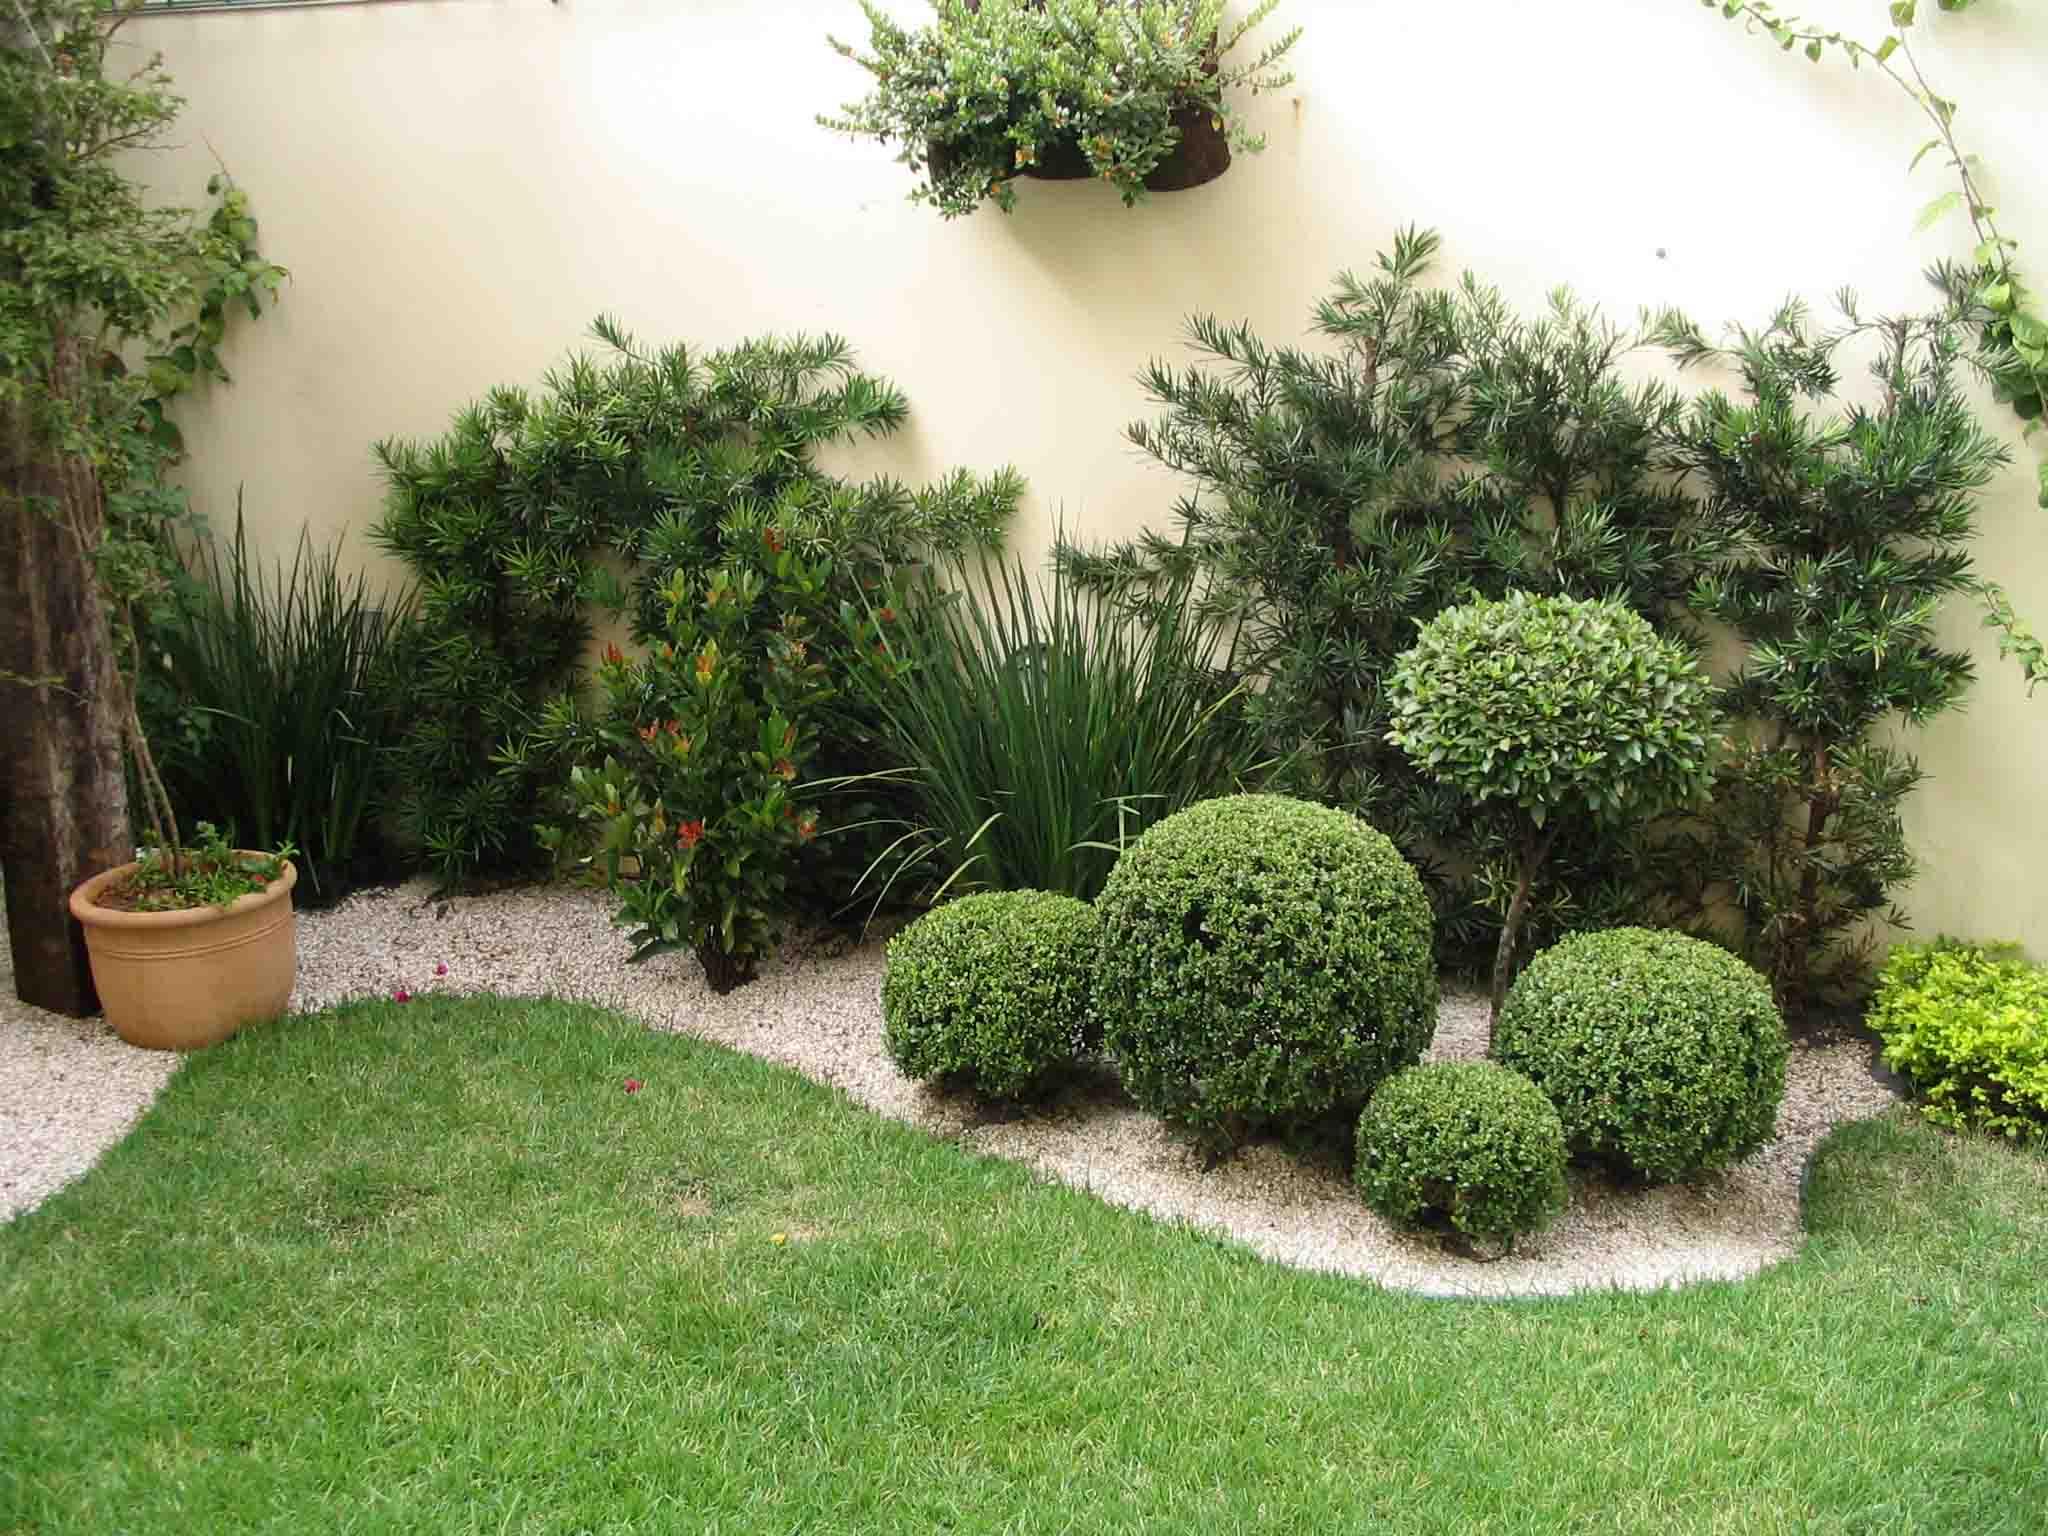 decoracao jardim residencial:Decoracao De Jardim Pequeno